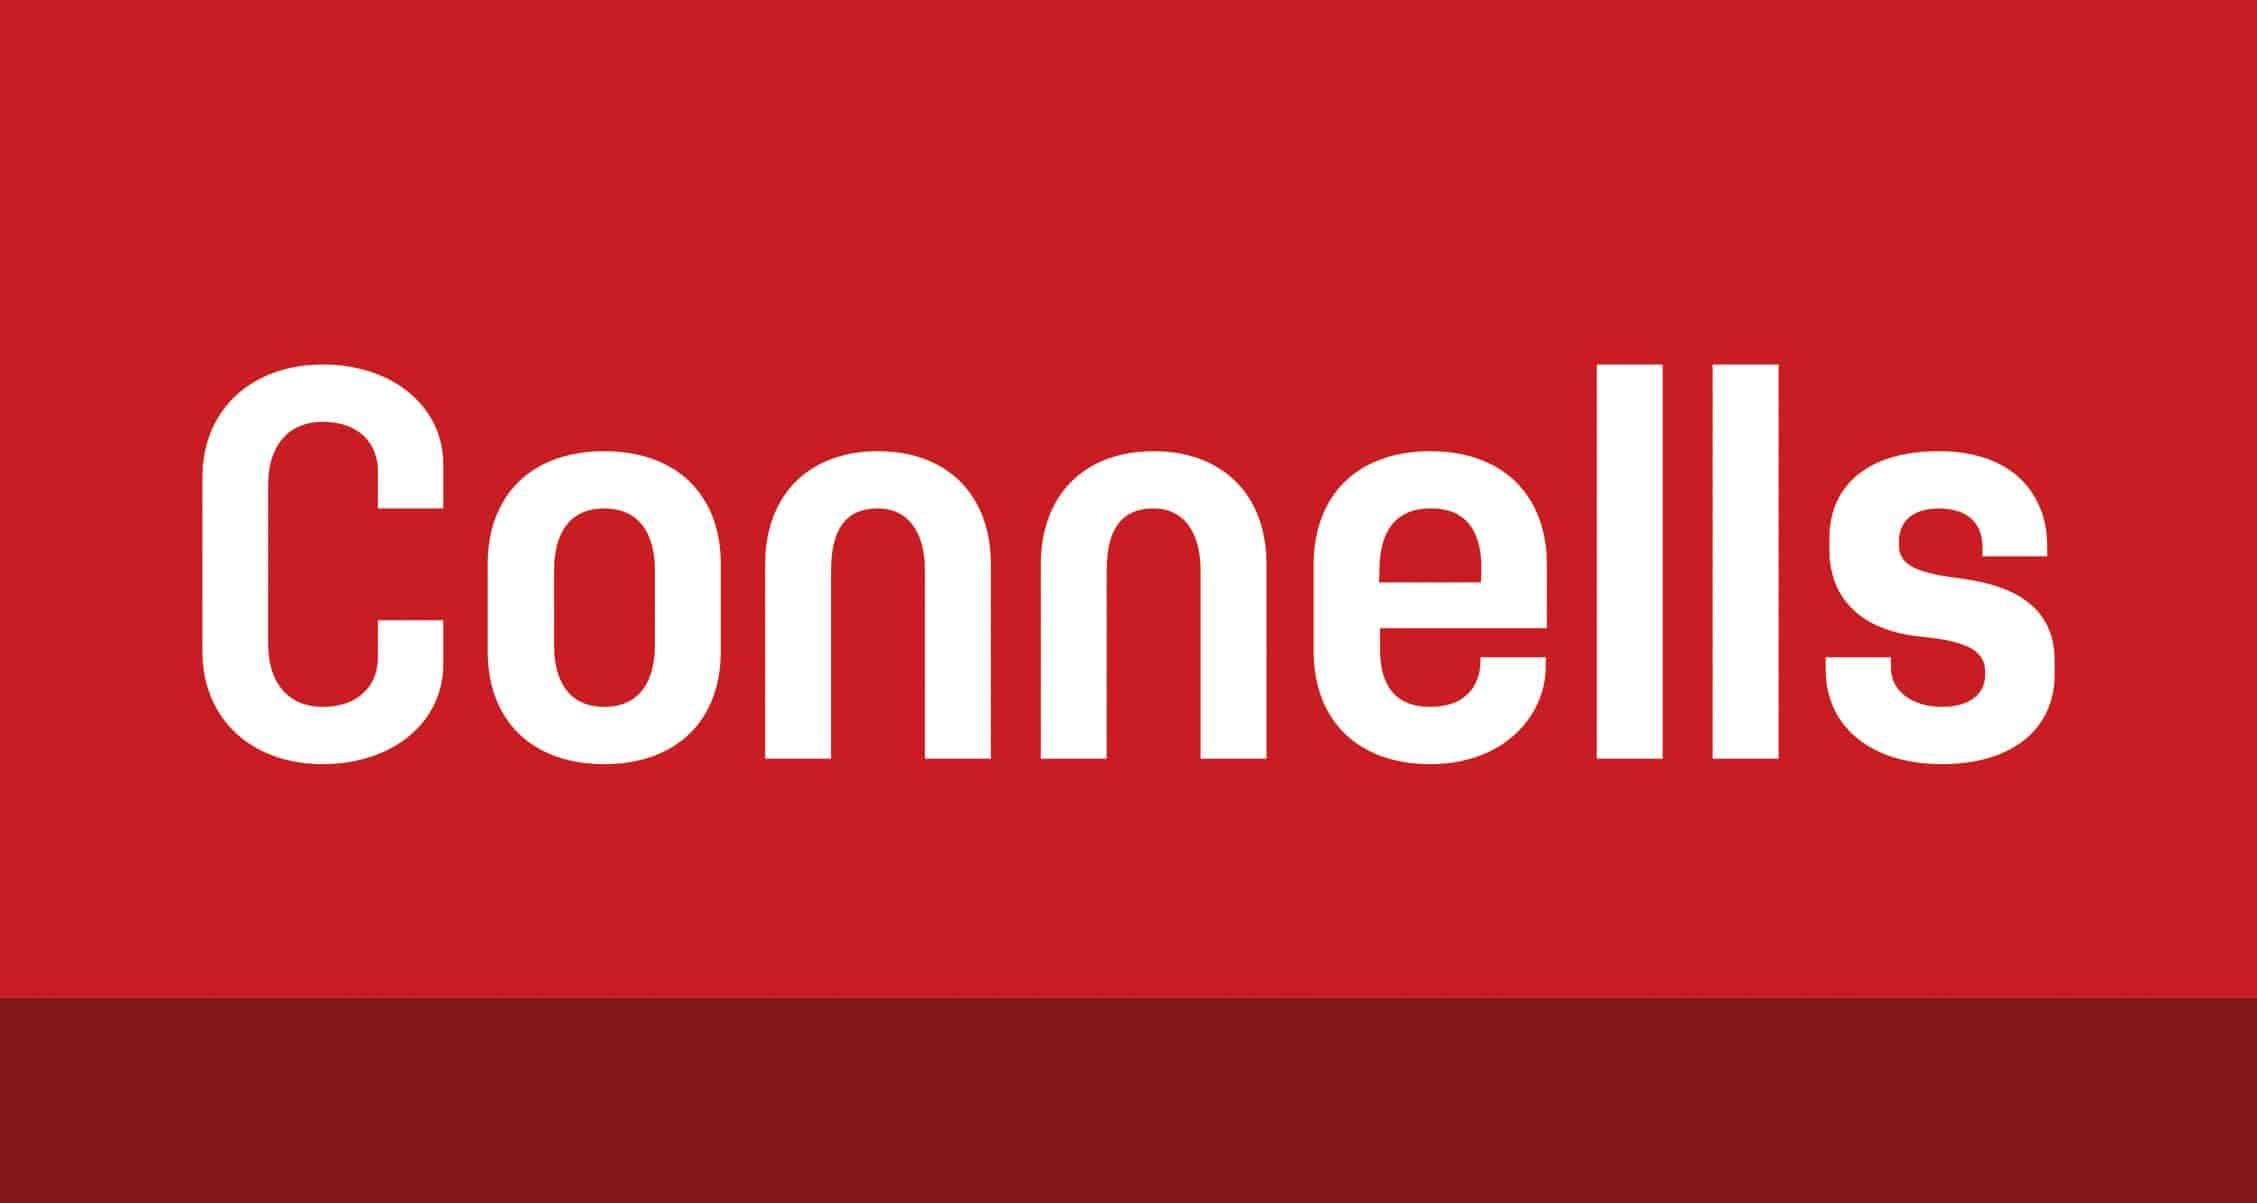 https://plymouthpropertymaintenance.co.uk/wp-content/uploads/2019/11/Connells-Logo-Large.jpg